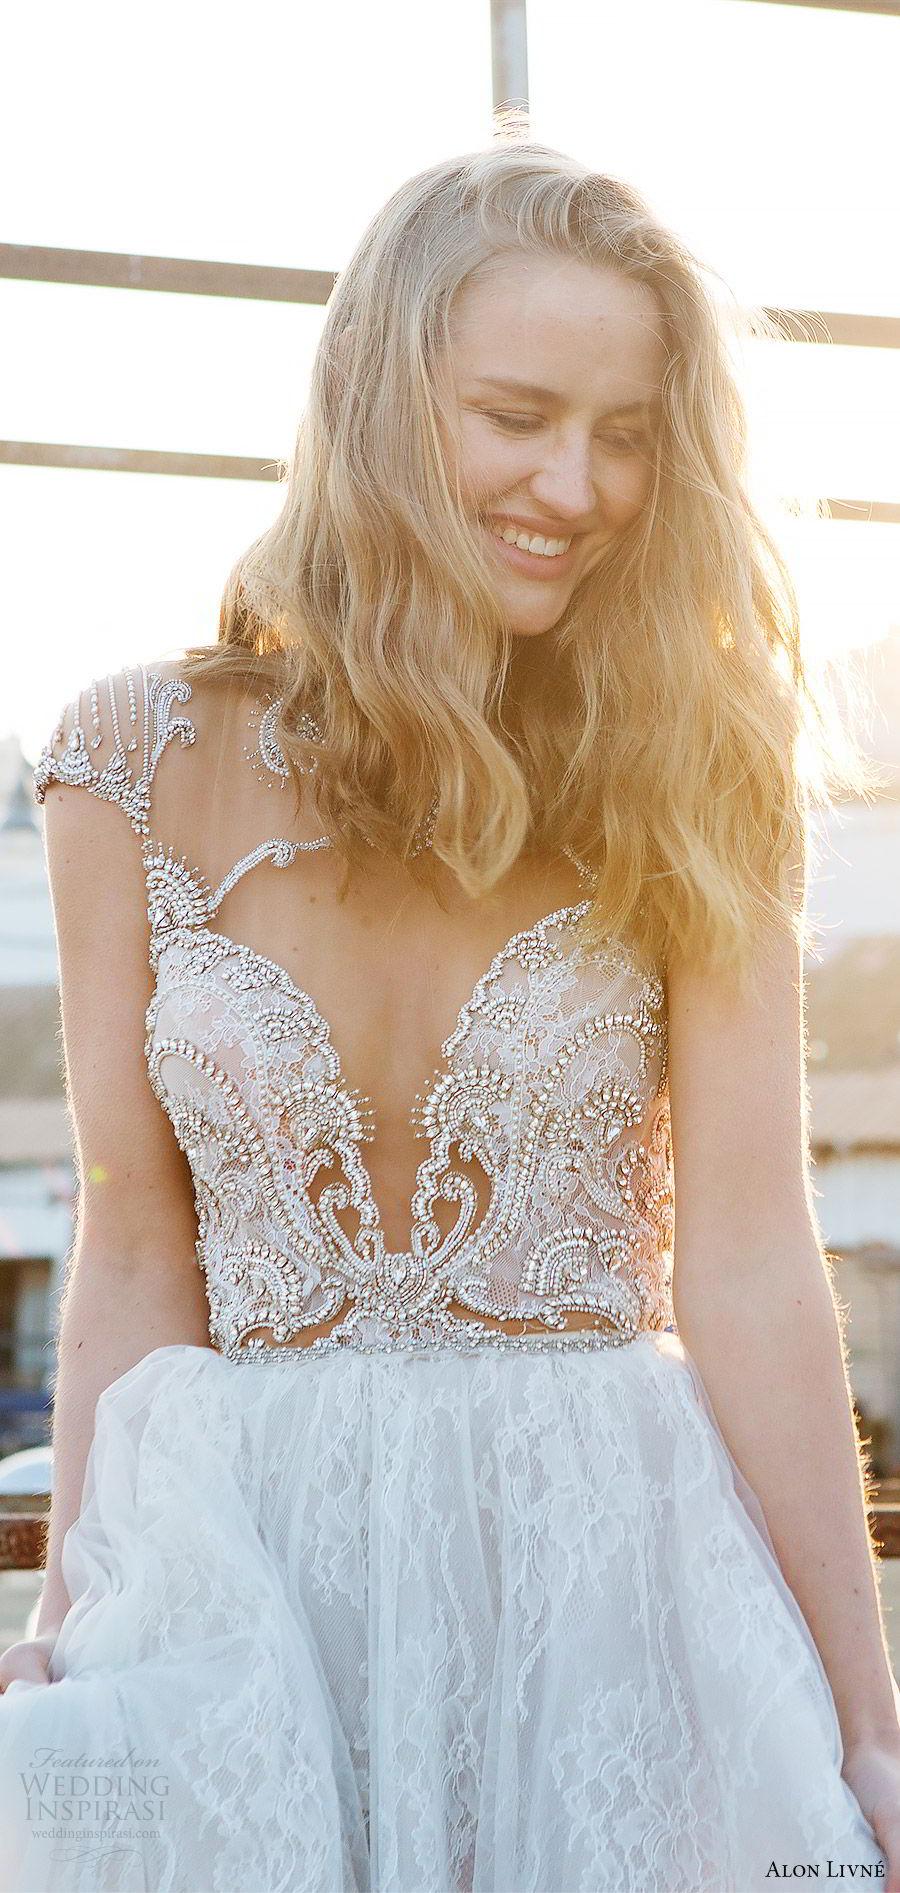 alon livne white pre 2018 bridal illusion cap sleeves sweetheart beaded bodice lace ball gown wedding dress (terri) mv princess romantic